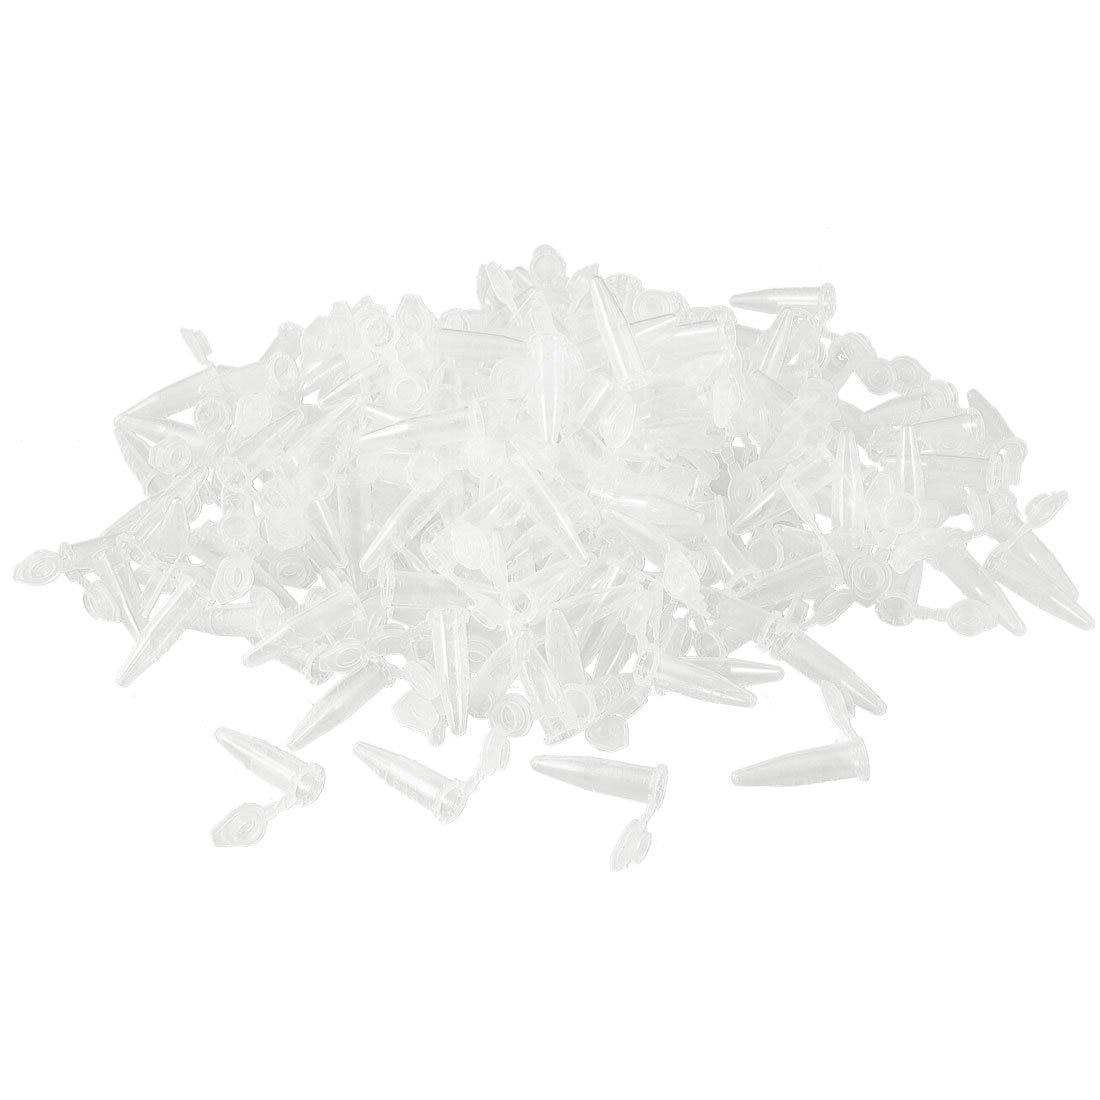 1000 Pcs Laboratory Clear White Mark Printed Plastic Centrifuge Tube 0.5ml